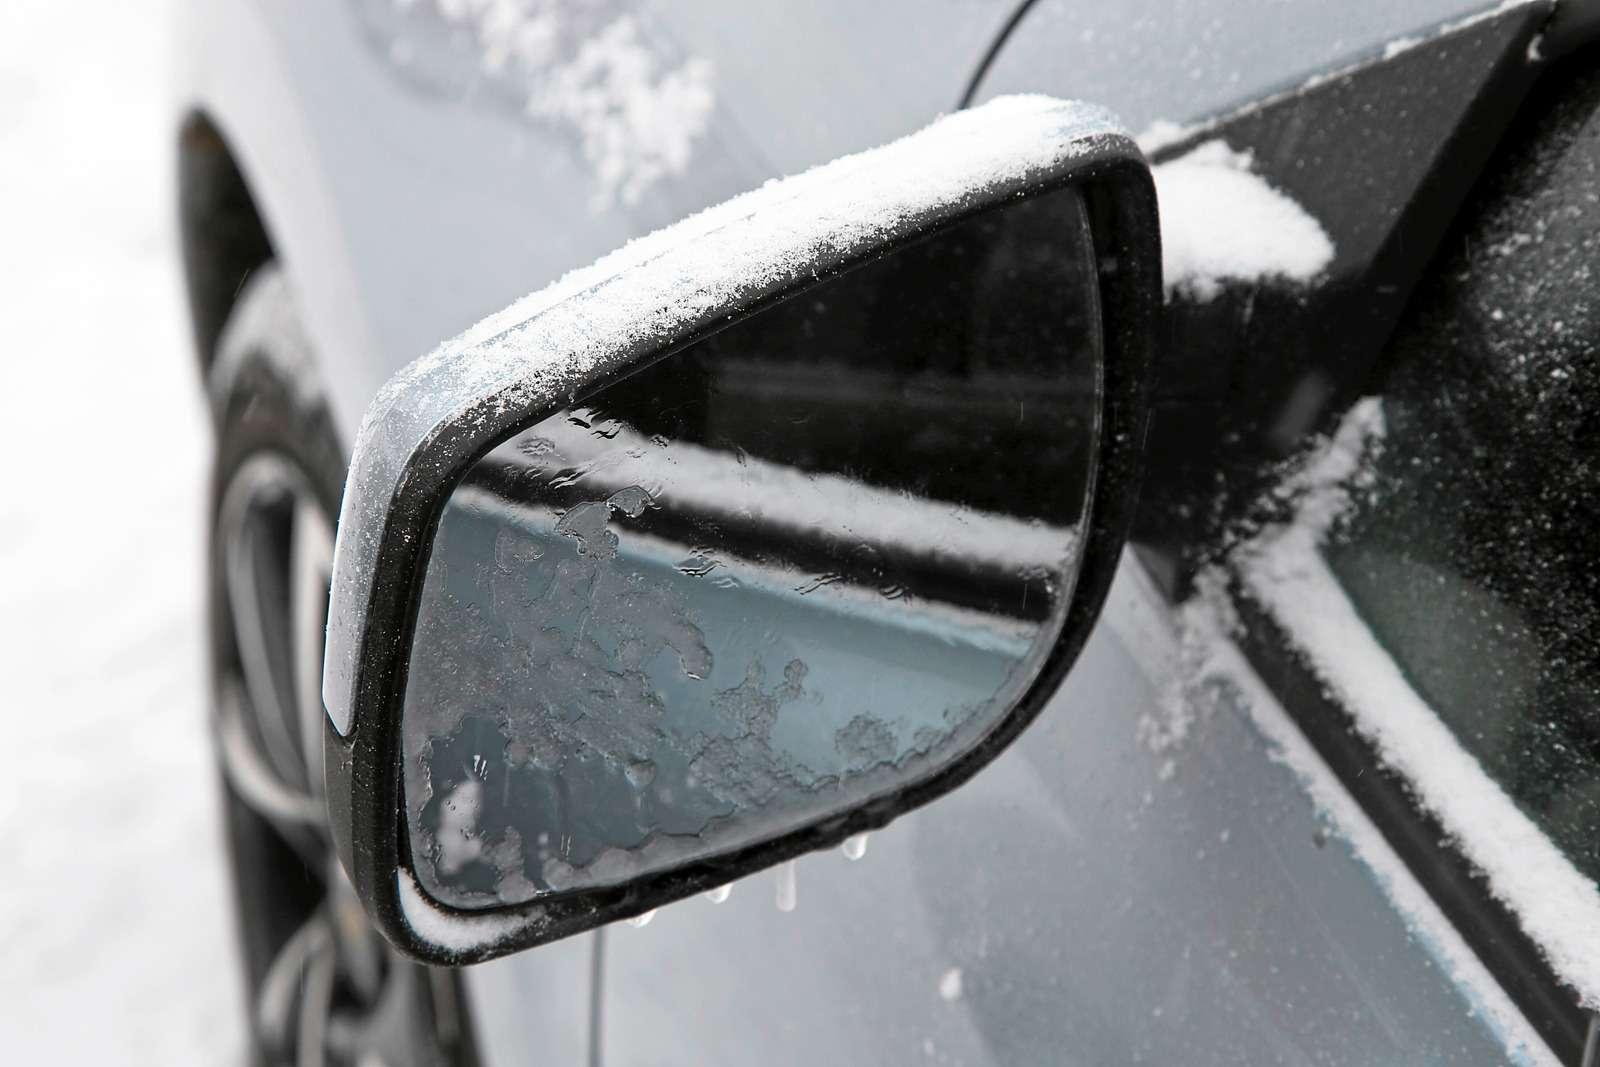 Большой зимний тест: Lada Vesta, Lada XRAY иDatsun mi-DO изпарка ЗР— фото 571422